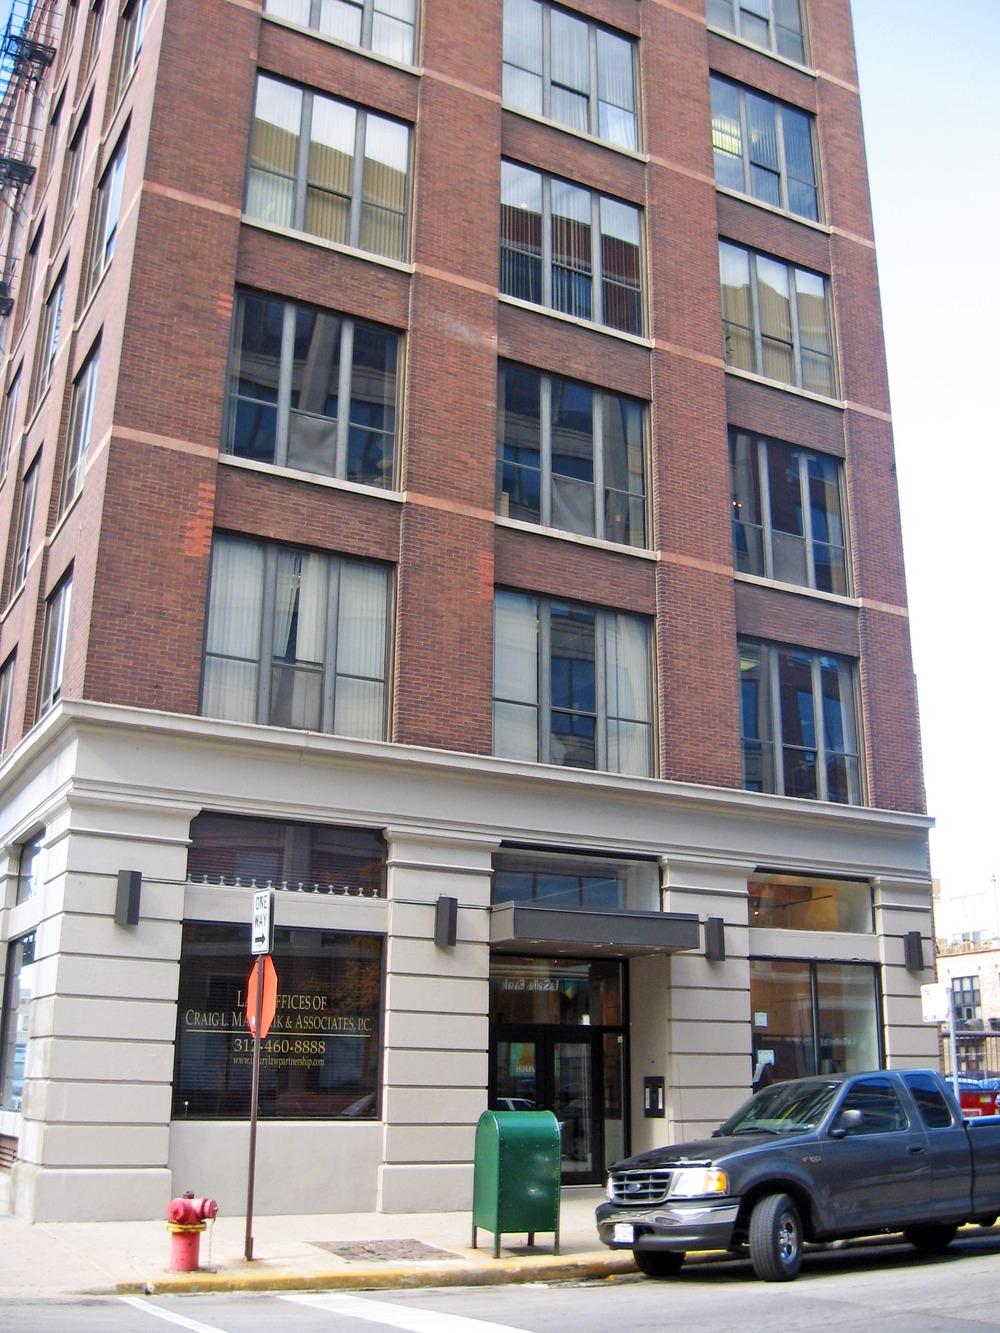 3 East Loft - W Jackson Blvd - Chicago - IL